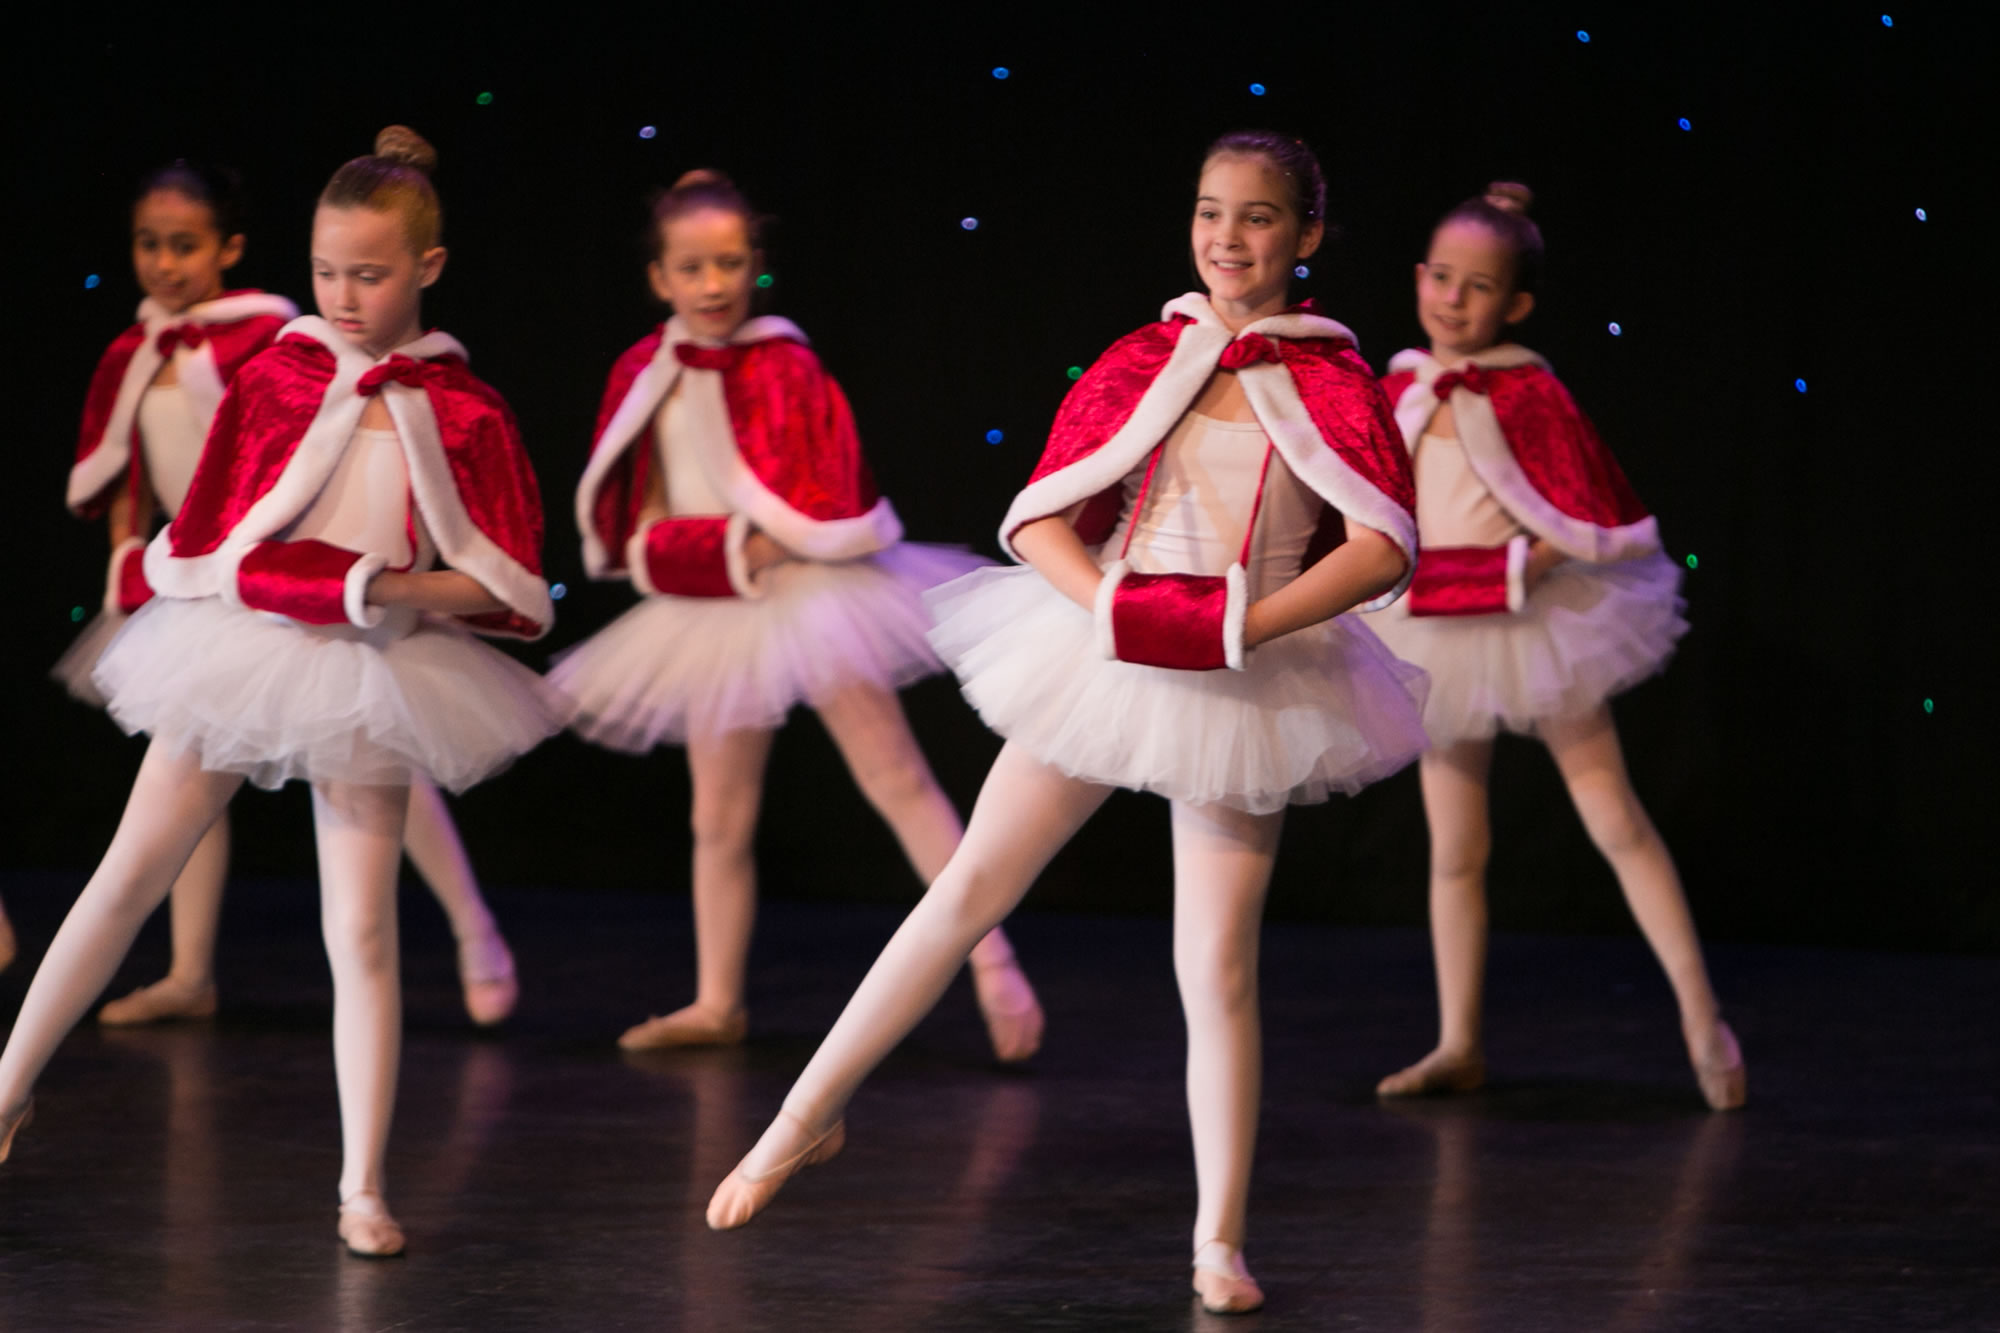 Hitchin_School_of_Dance_Show_2019-SM1_1936.jpg